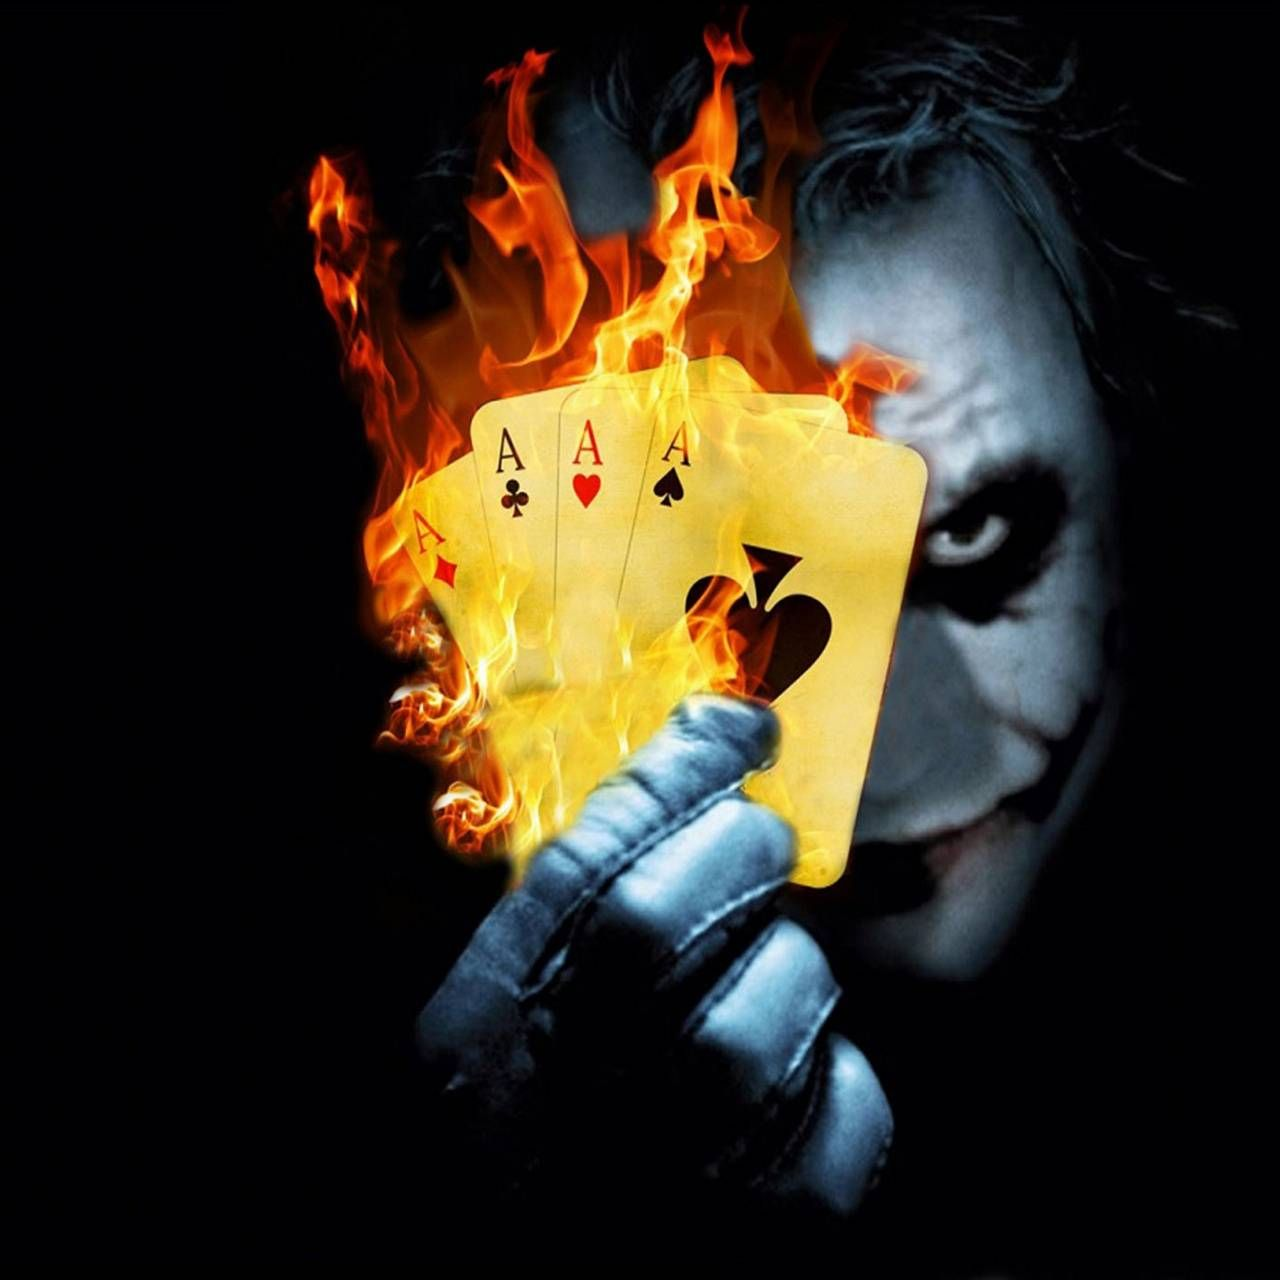 Download Joker Wallpaper By Baddelta 71 Free On Zedge Now Browse Millions Of Popular Cartas Wa Joker Iphone Wallpaper Joker Wallpapers Joker Hd Wallpaper